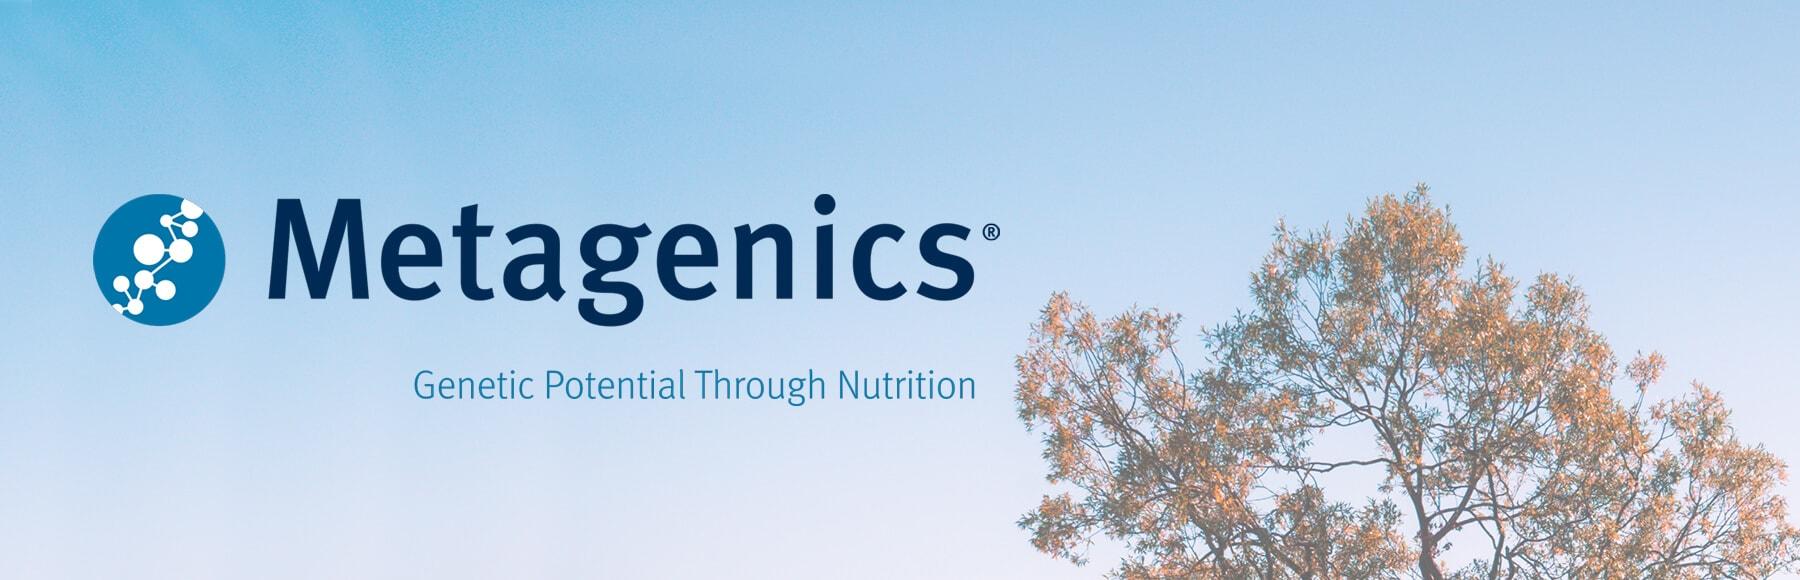 Metagenics Banner